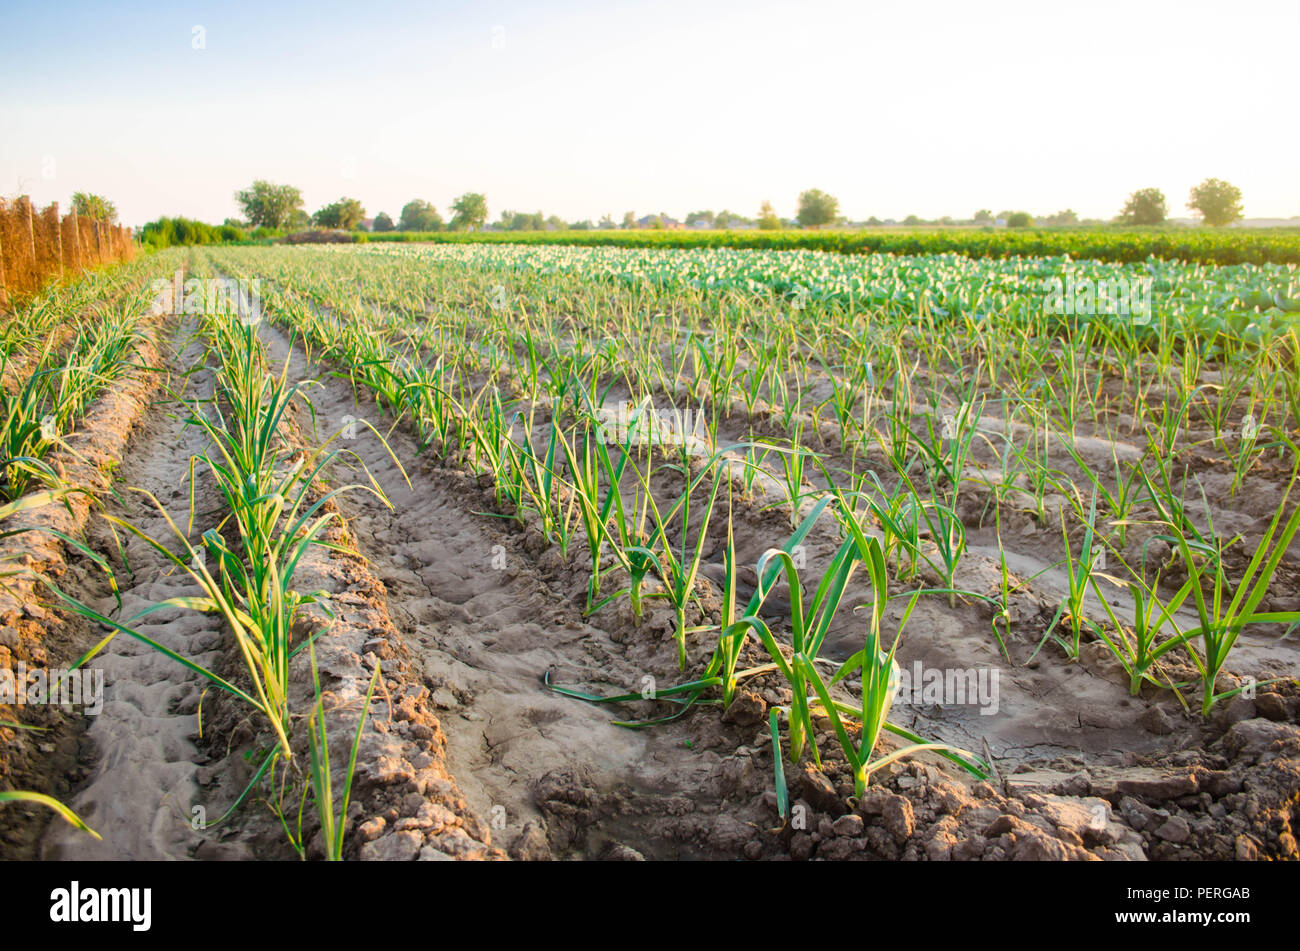 leek growing in the field  Agriculture, vegetables, organic